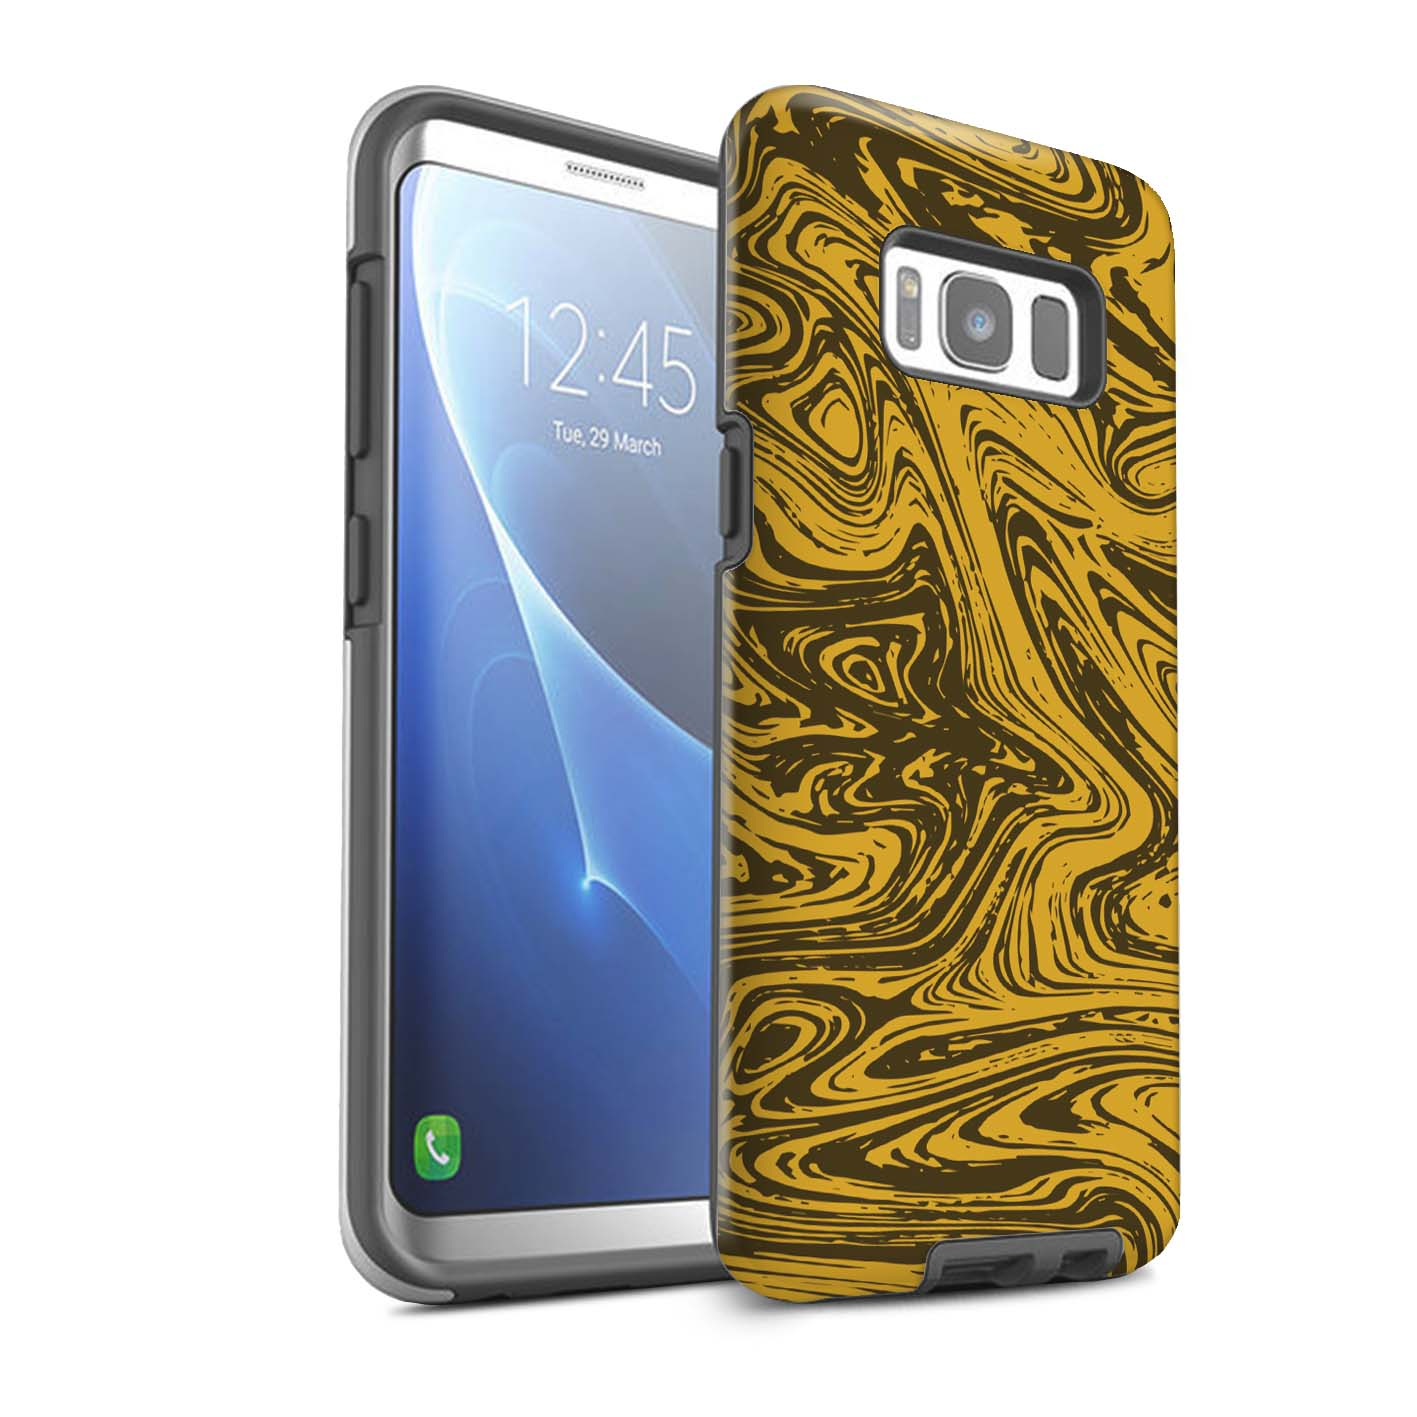 Robuste-Matte-Coque-pour-Samsung-Galaxy-S8-Plus-G955-Effet-Metal-Liquide-Fondu